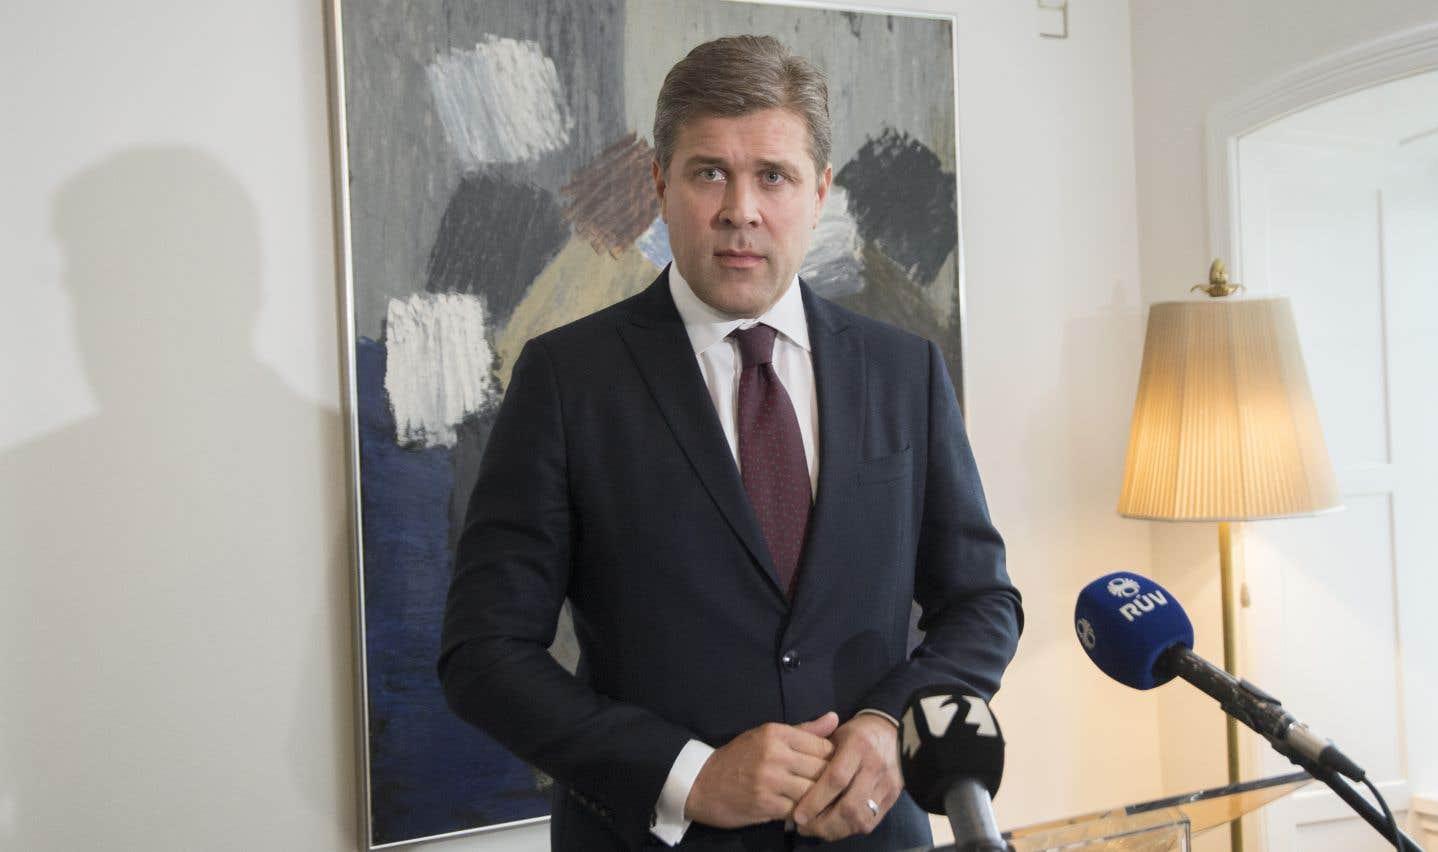 Le premier ministre islandais, Bjarni Benediktsson, en septembre dernier à Reykjavik